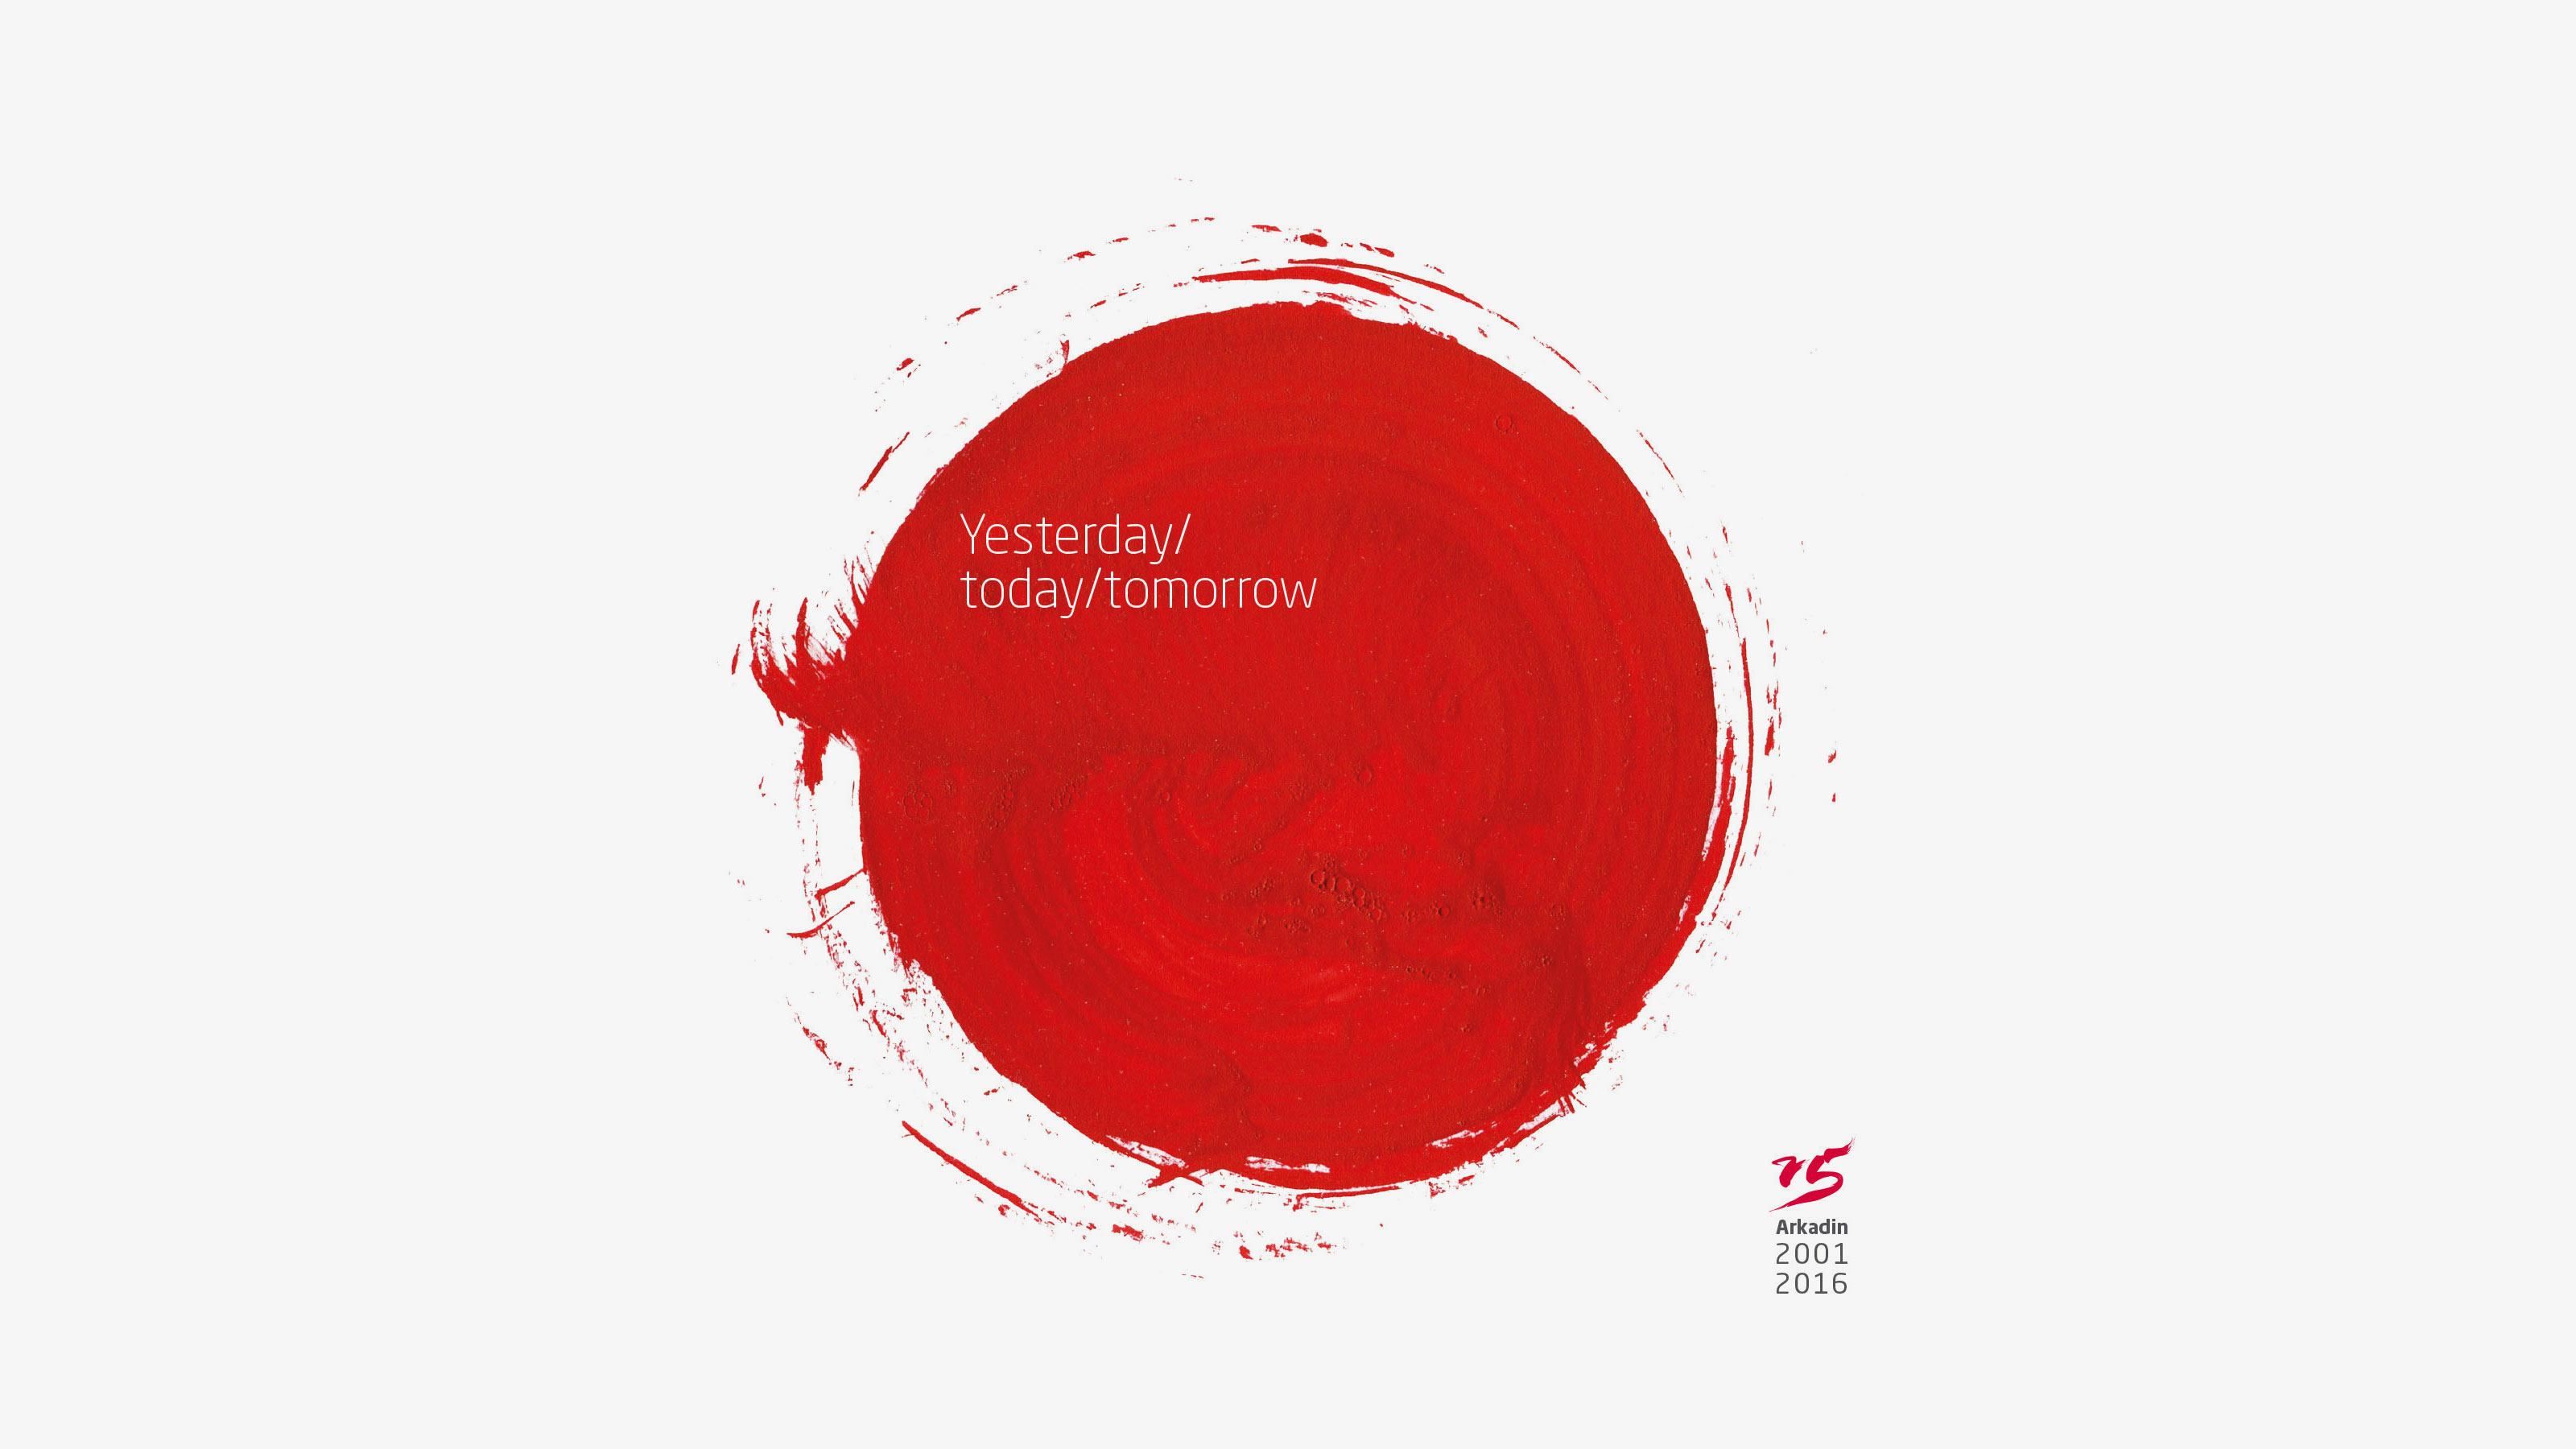 Marketing red circle Arkadin